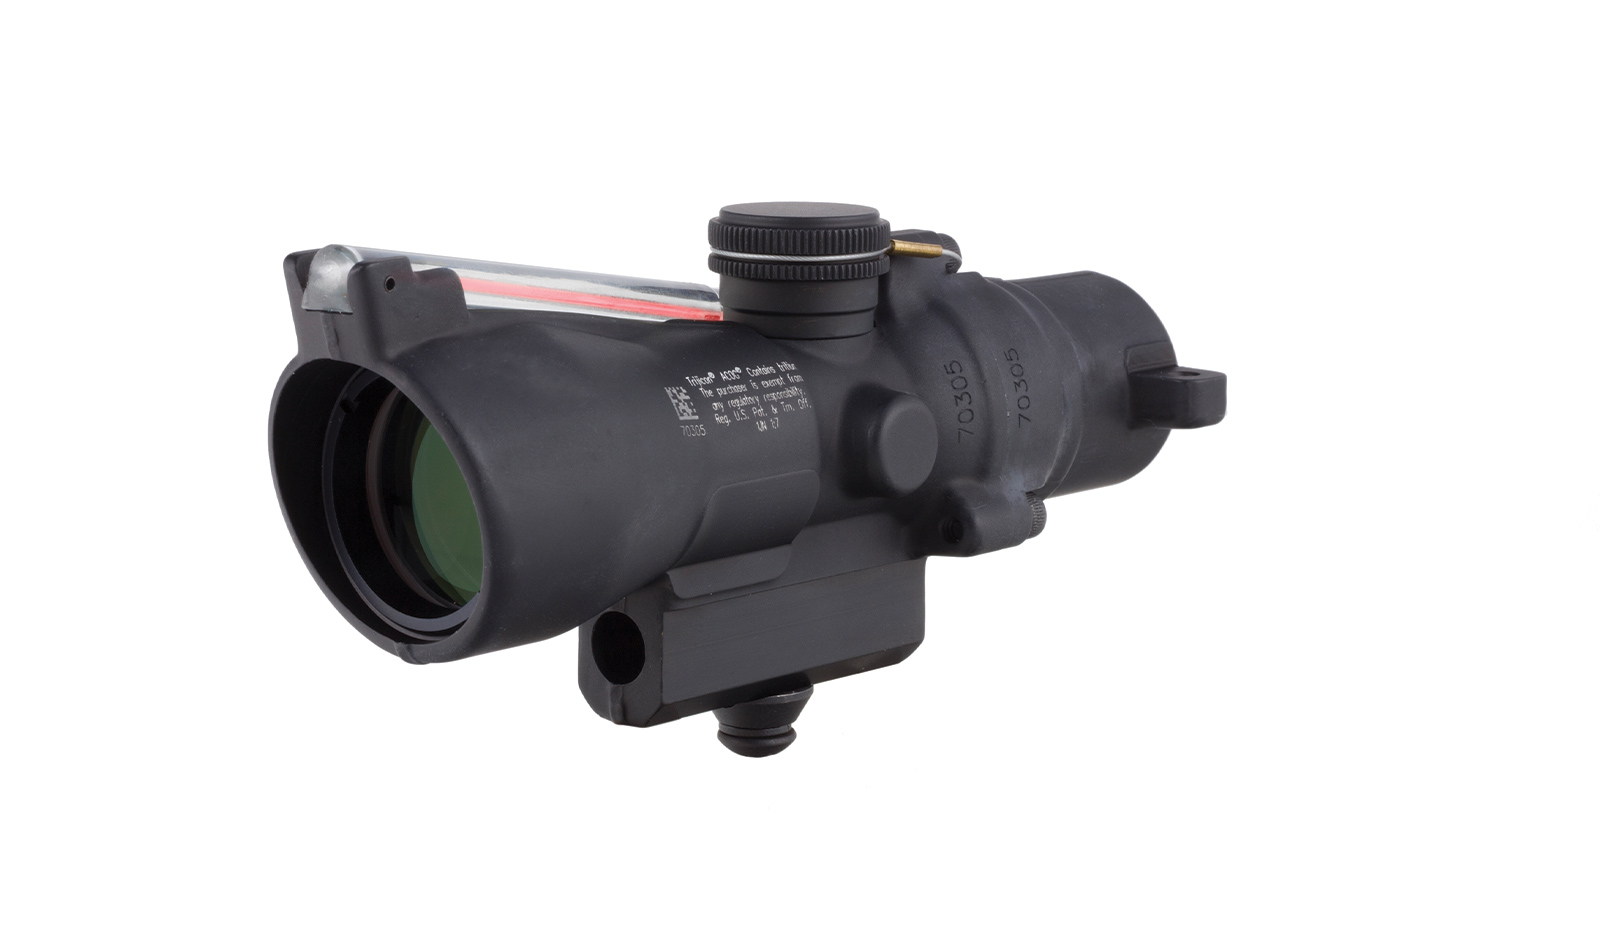 TA50-C-400223 angle 1